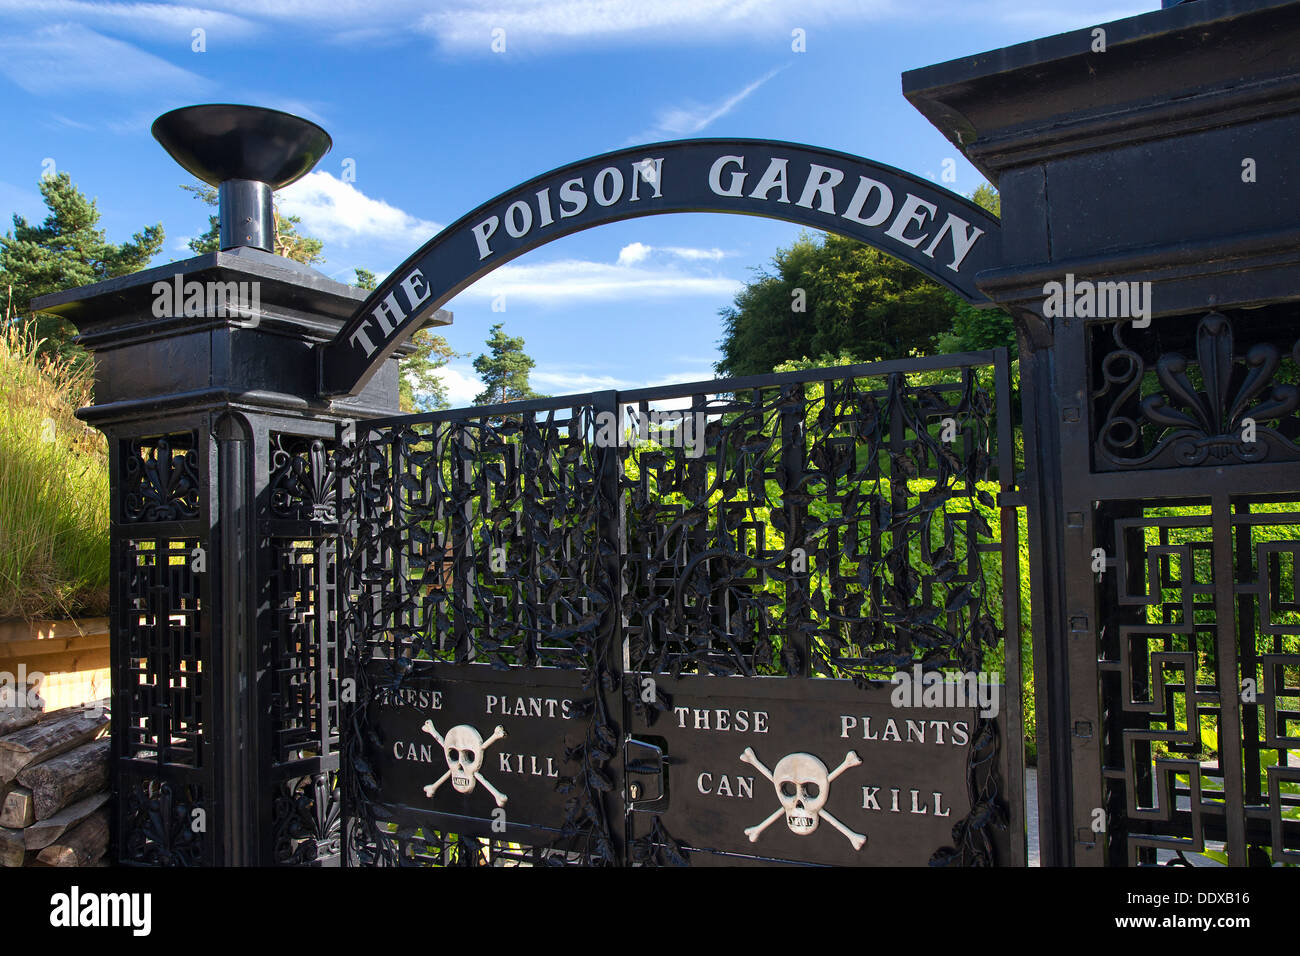 The Poison Garden entrance gates, Alnwick, Northumberland - Stock Image